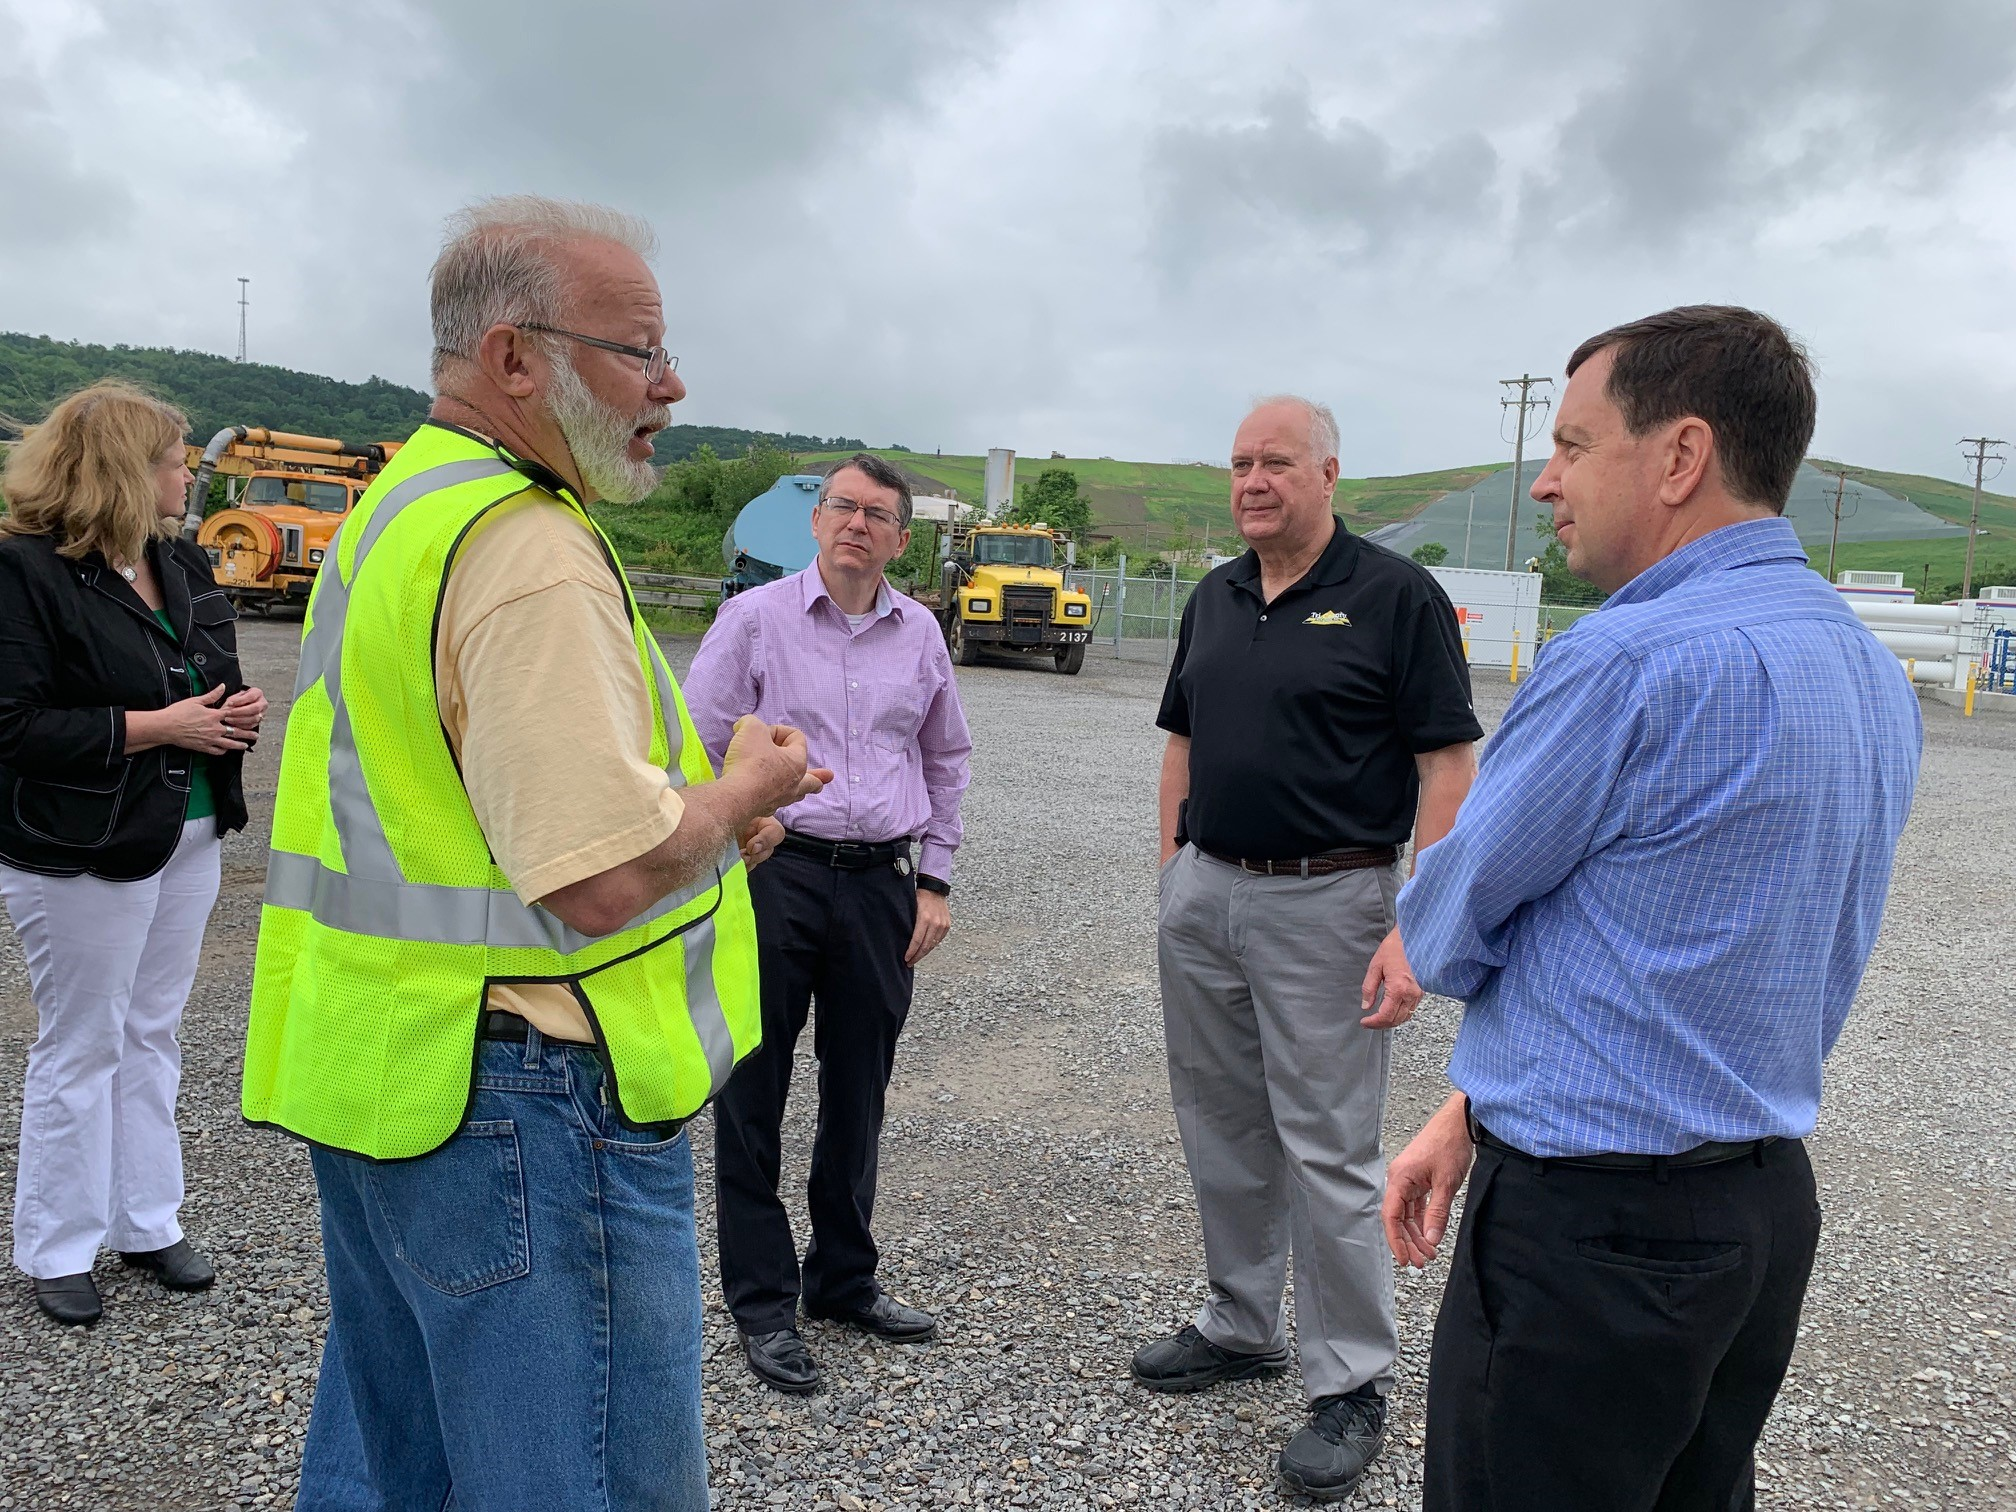 DEP Secretary Tours Vogel Holdings' Compressed Natural Gas Filling Station and High BTU Gas Processing Plant at Seneca Landfill